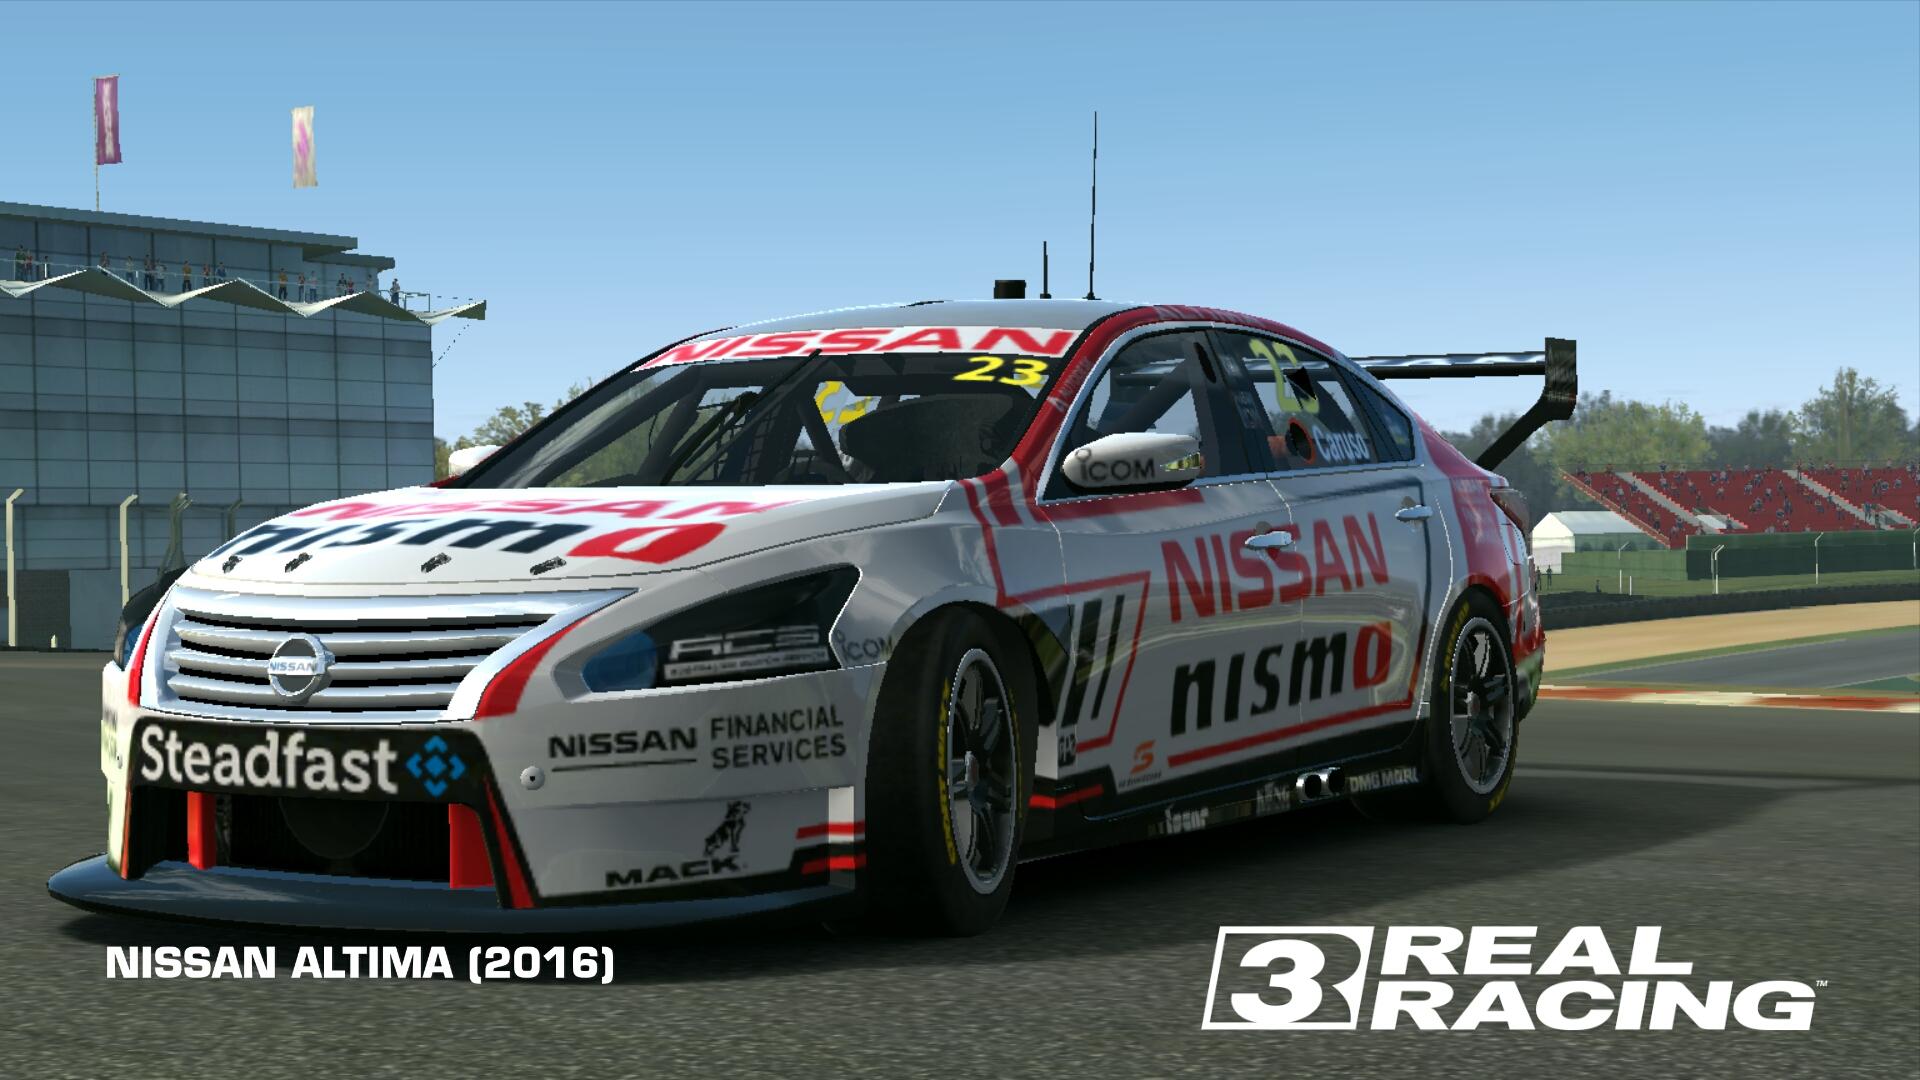 Nissan Altima Wiki >> Nissan Altima 2016 Real Racing 3 Wiki Fandom Powered